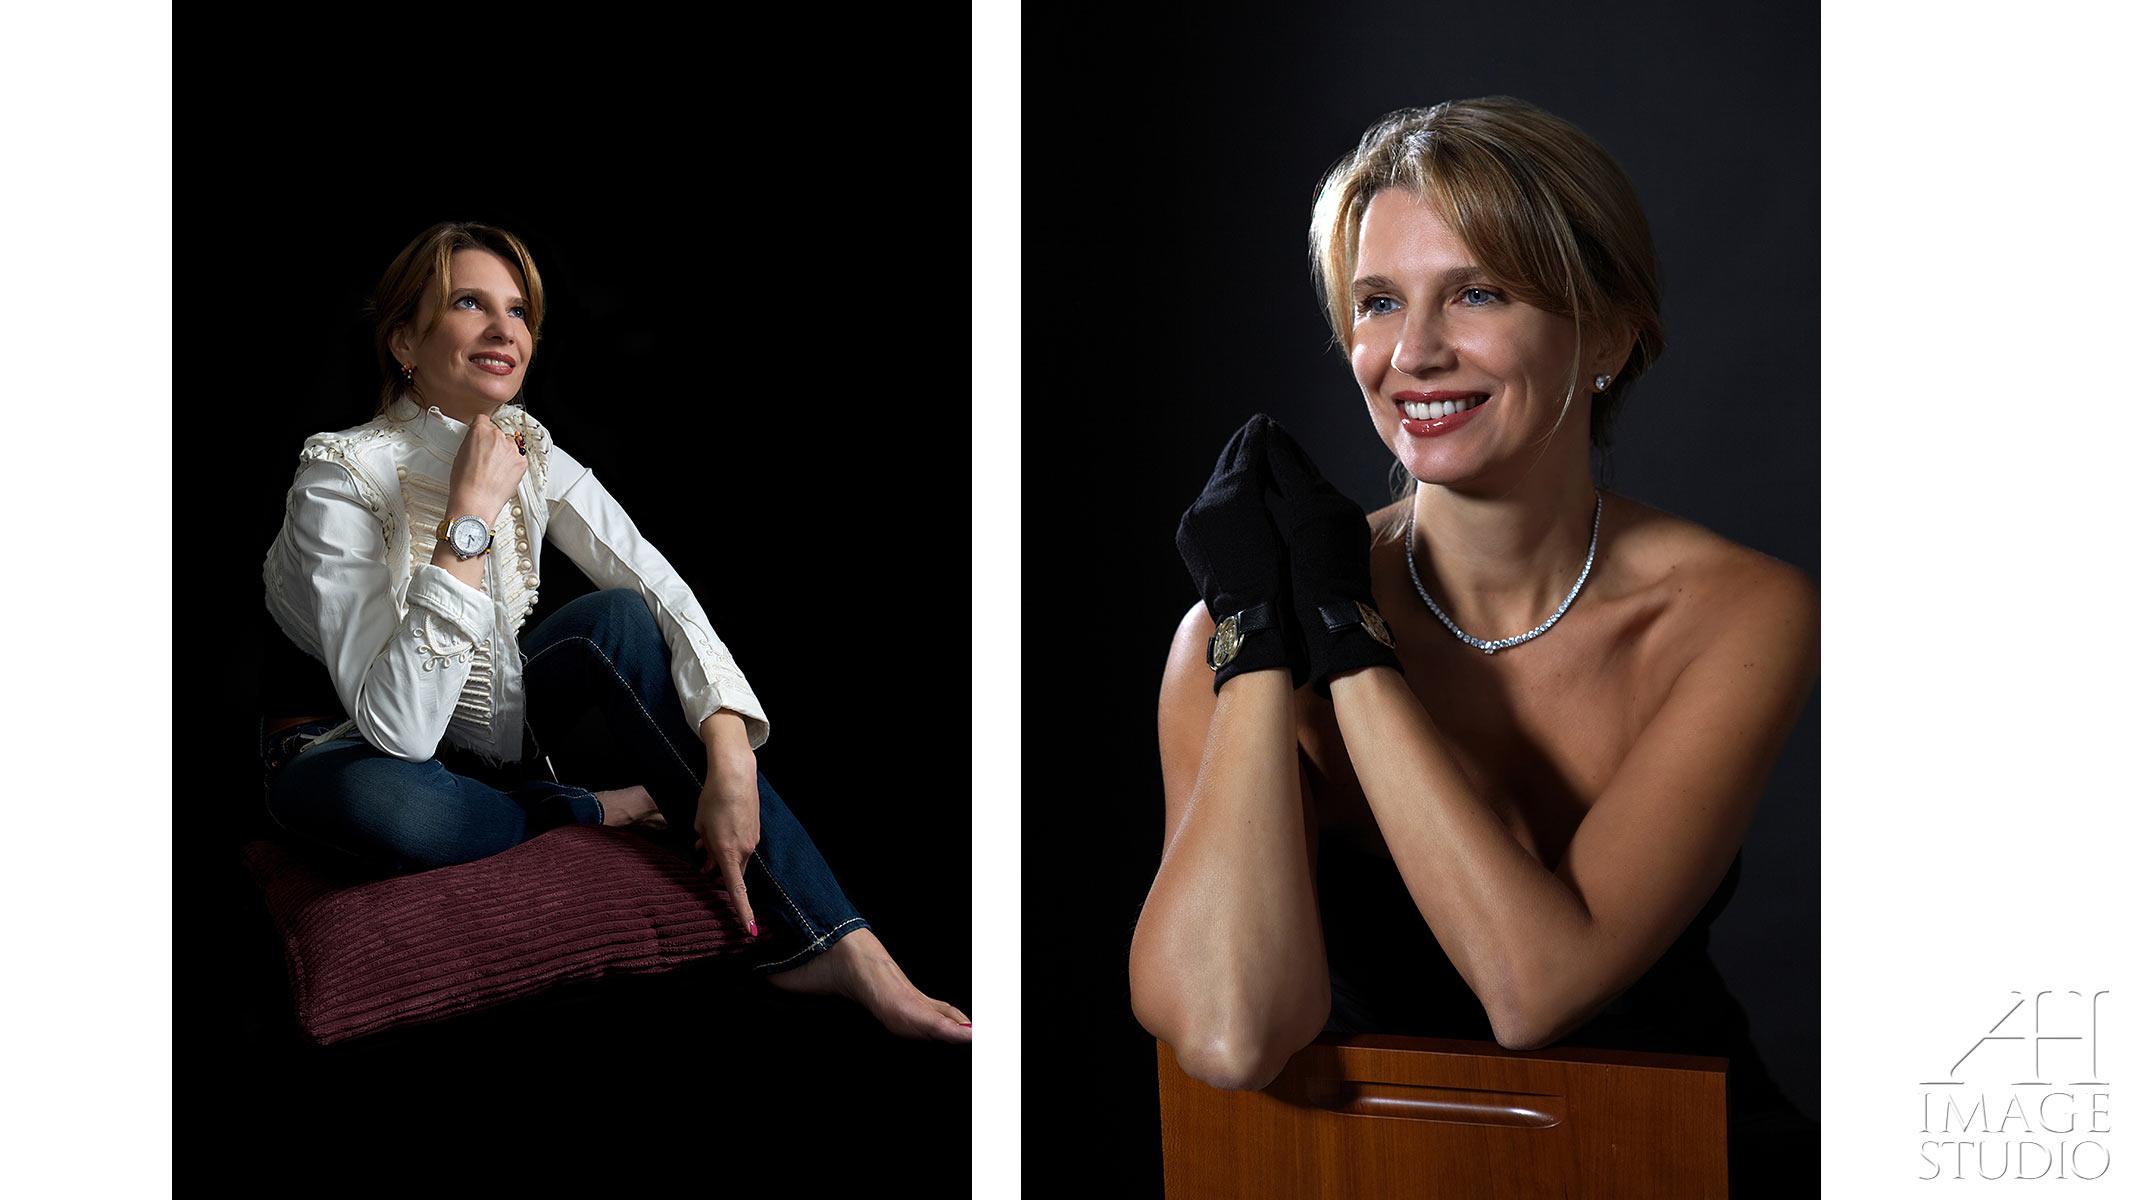 creative photography self portrait photographers